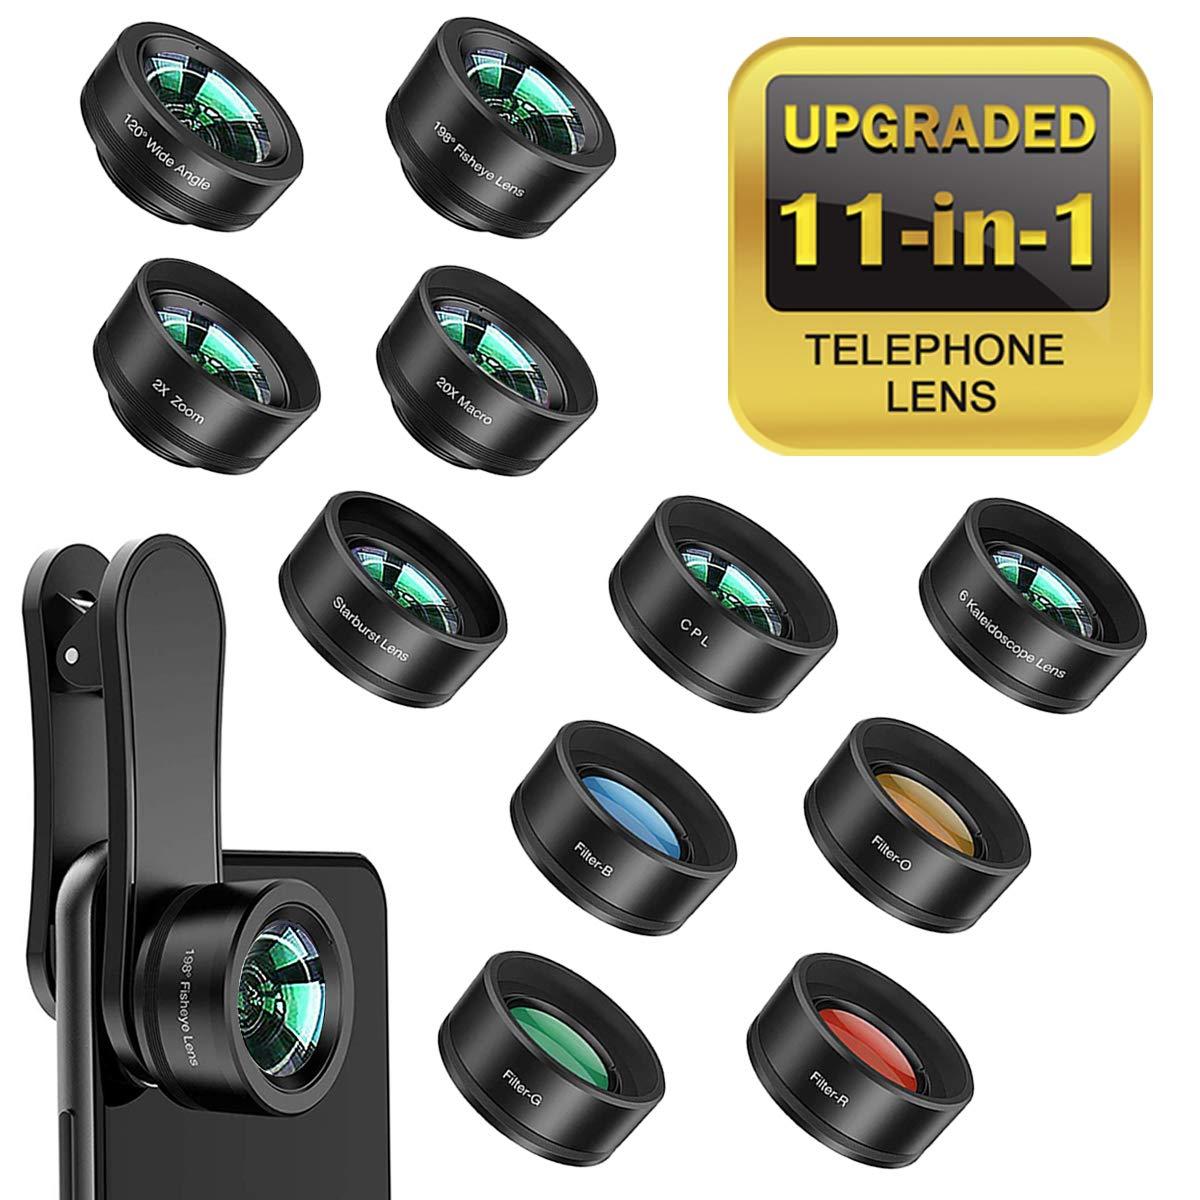 4b6dd1f7b1 11 en 1 Kit de Lentes móviles,Lentes de telefono, Gran Angular, Macro, Ojo  de pez,teleobjetivo, caleidoscopio, Cuatro filtros de color, ...